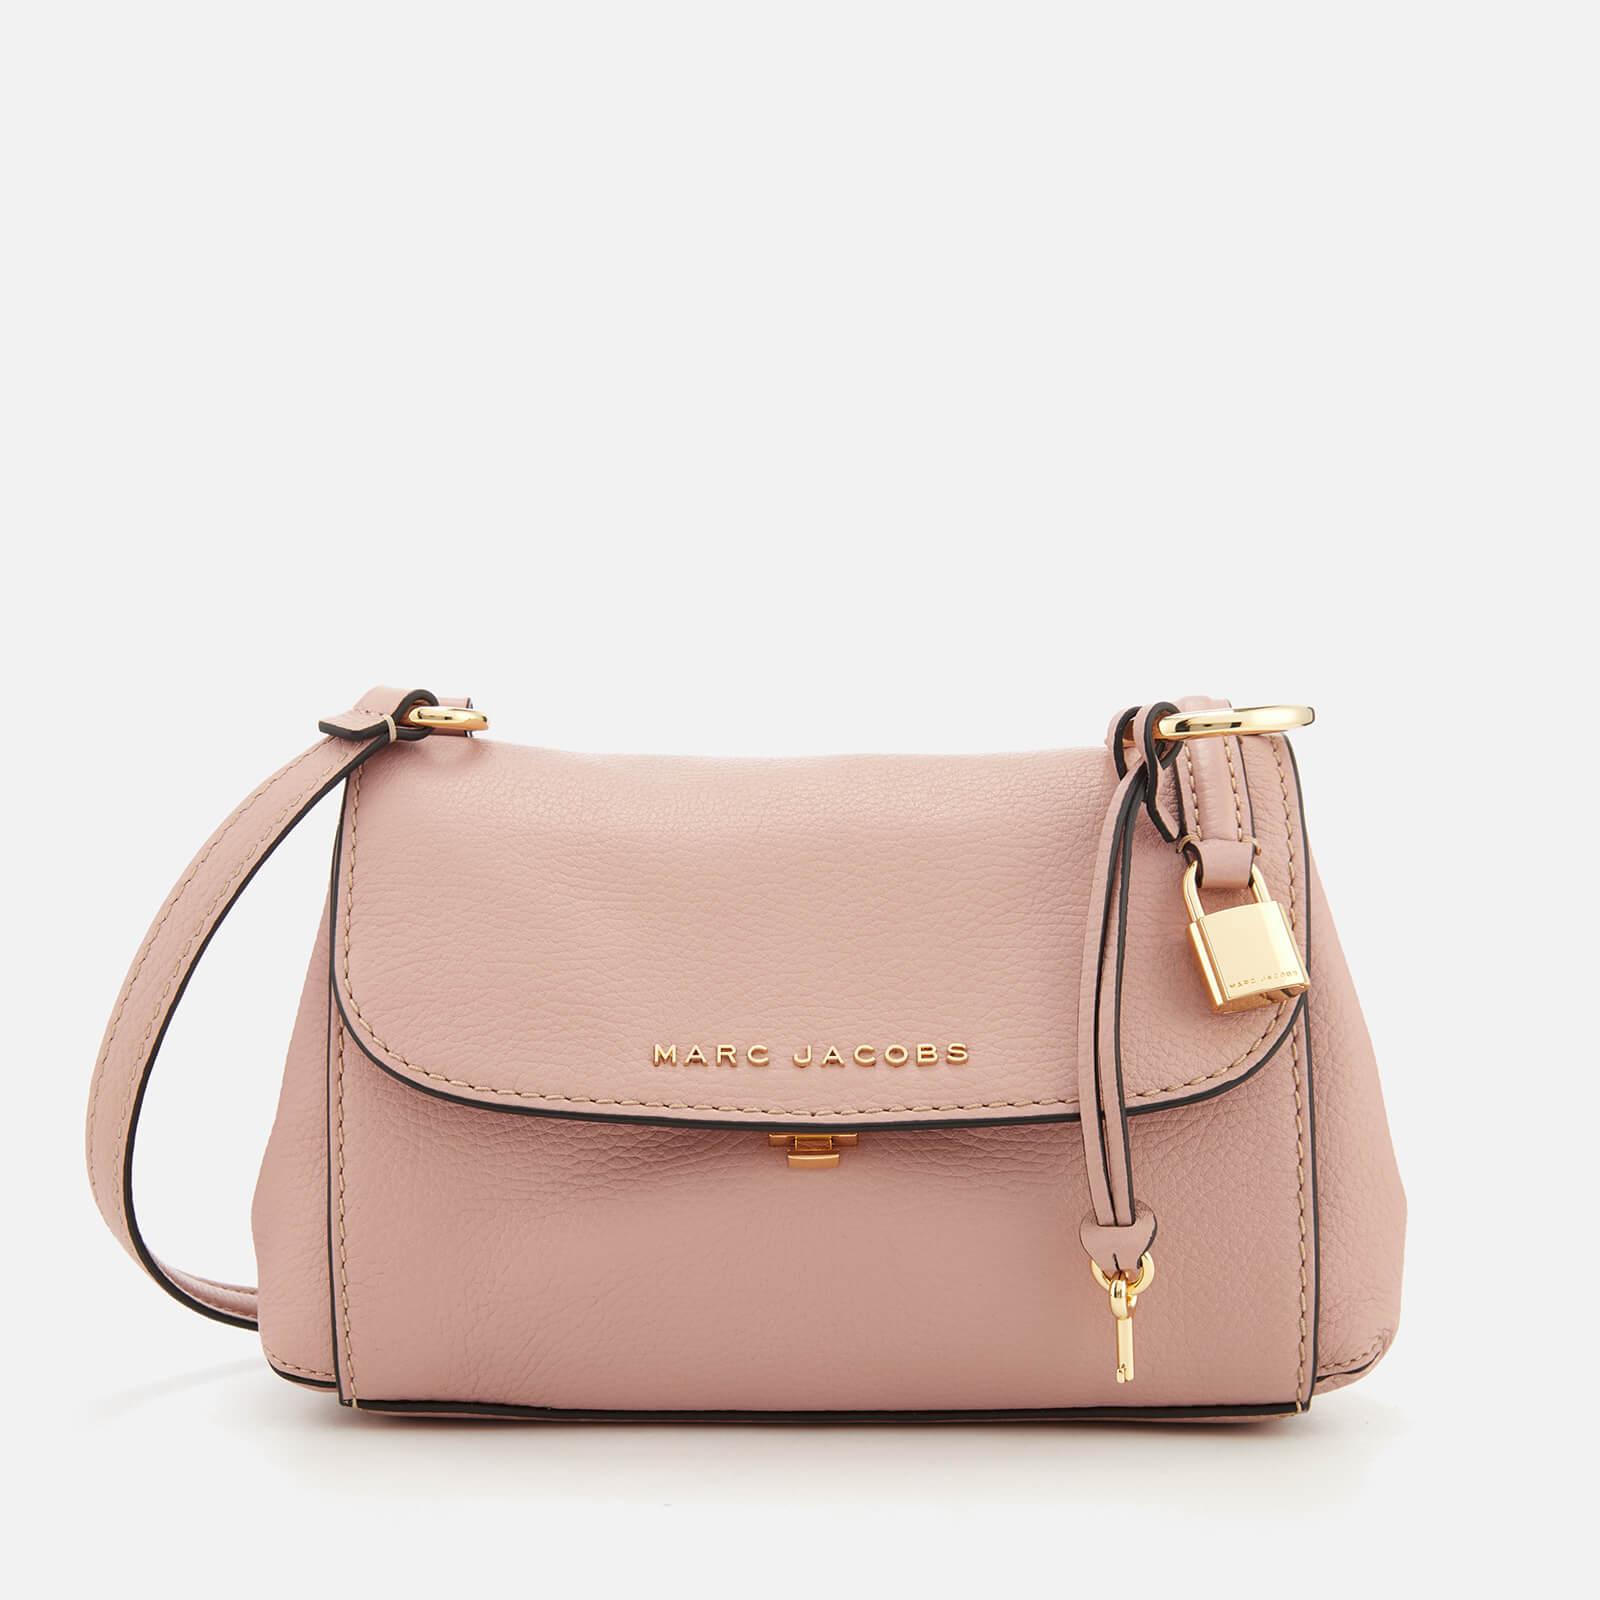 87948bc53d Marc Jacobs Women s Mini Boho Grind Bag - Rose - Free UK Delivery over £50